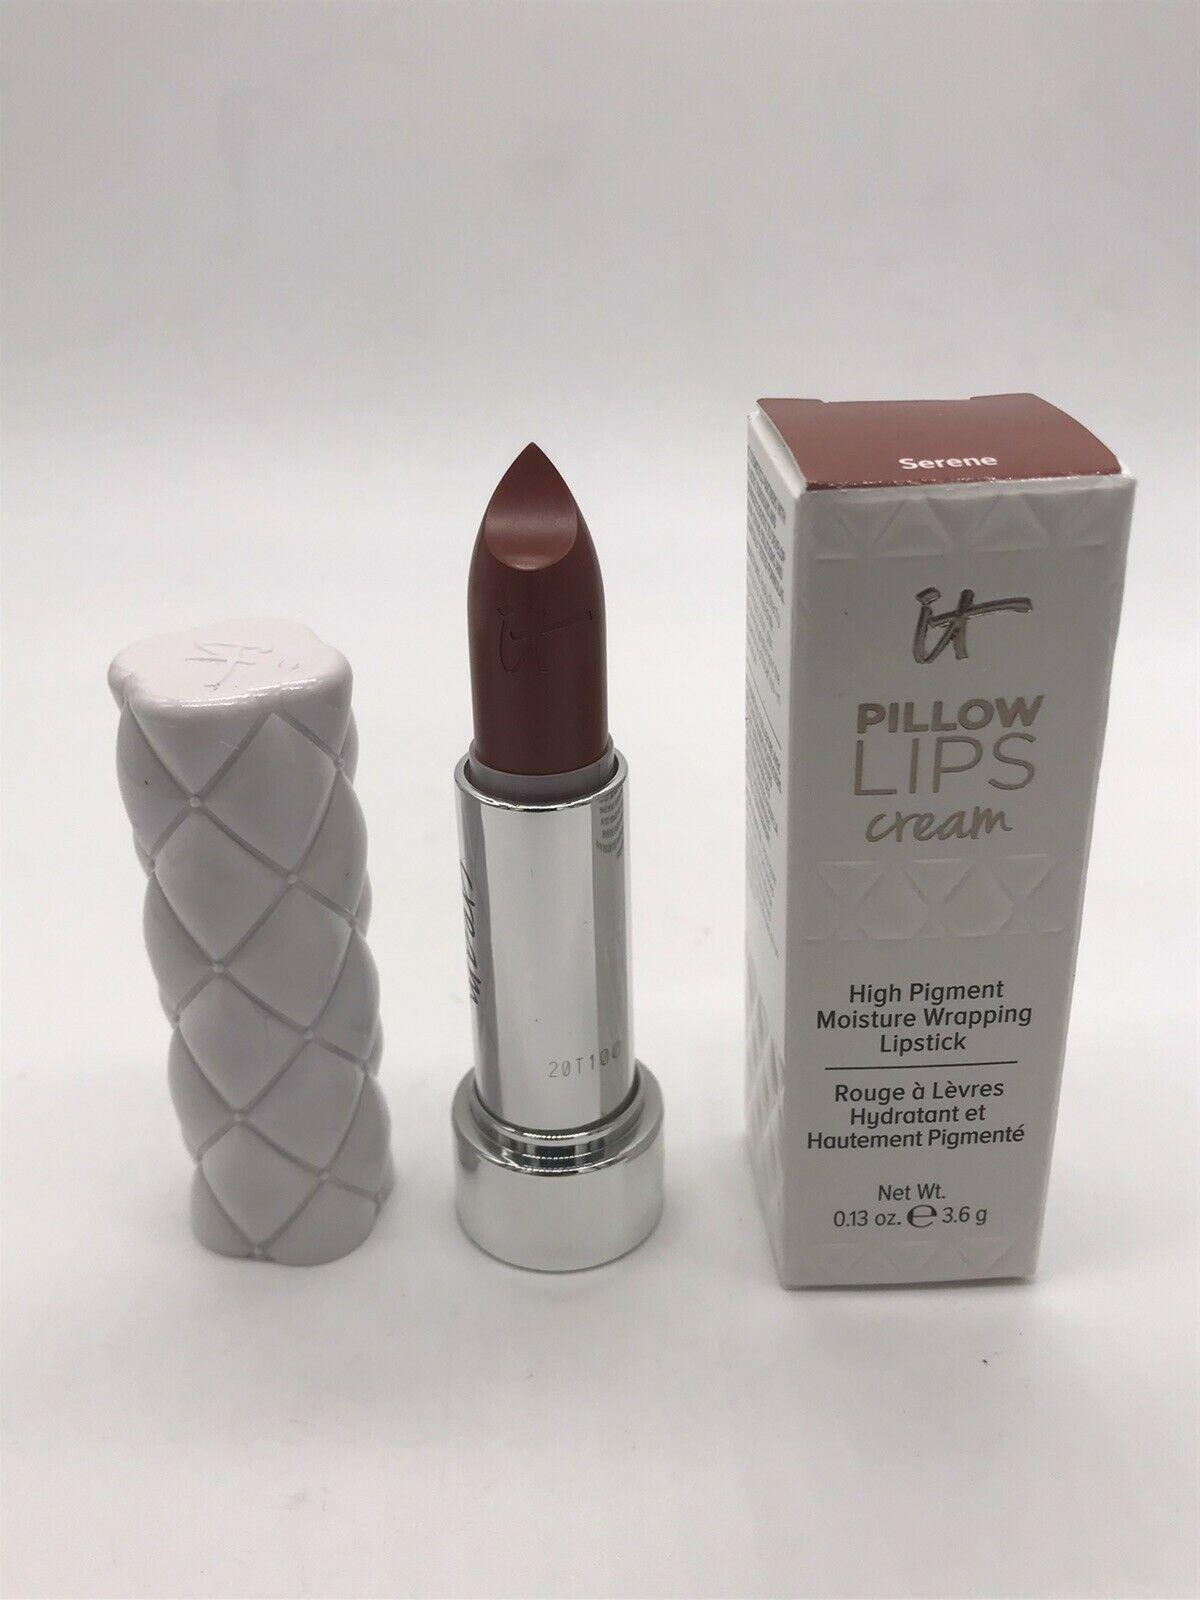 It Cosmetics Pillow Lips CREAM Lipstick Full Size SERENE (Terracotta Brown) BNIB - $14.31